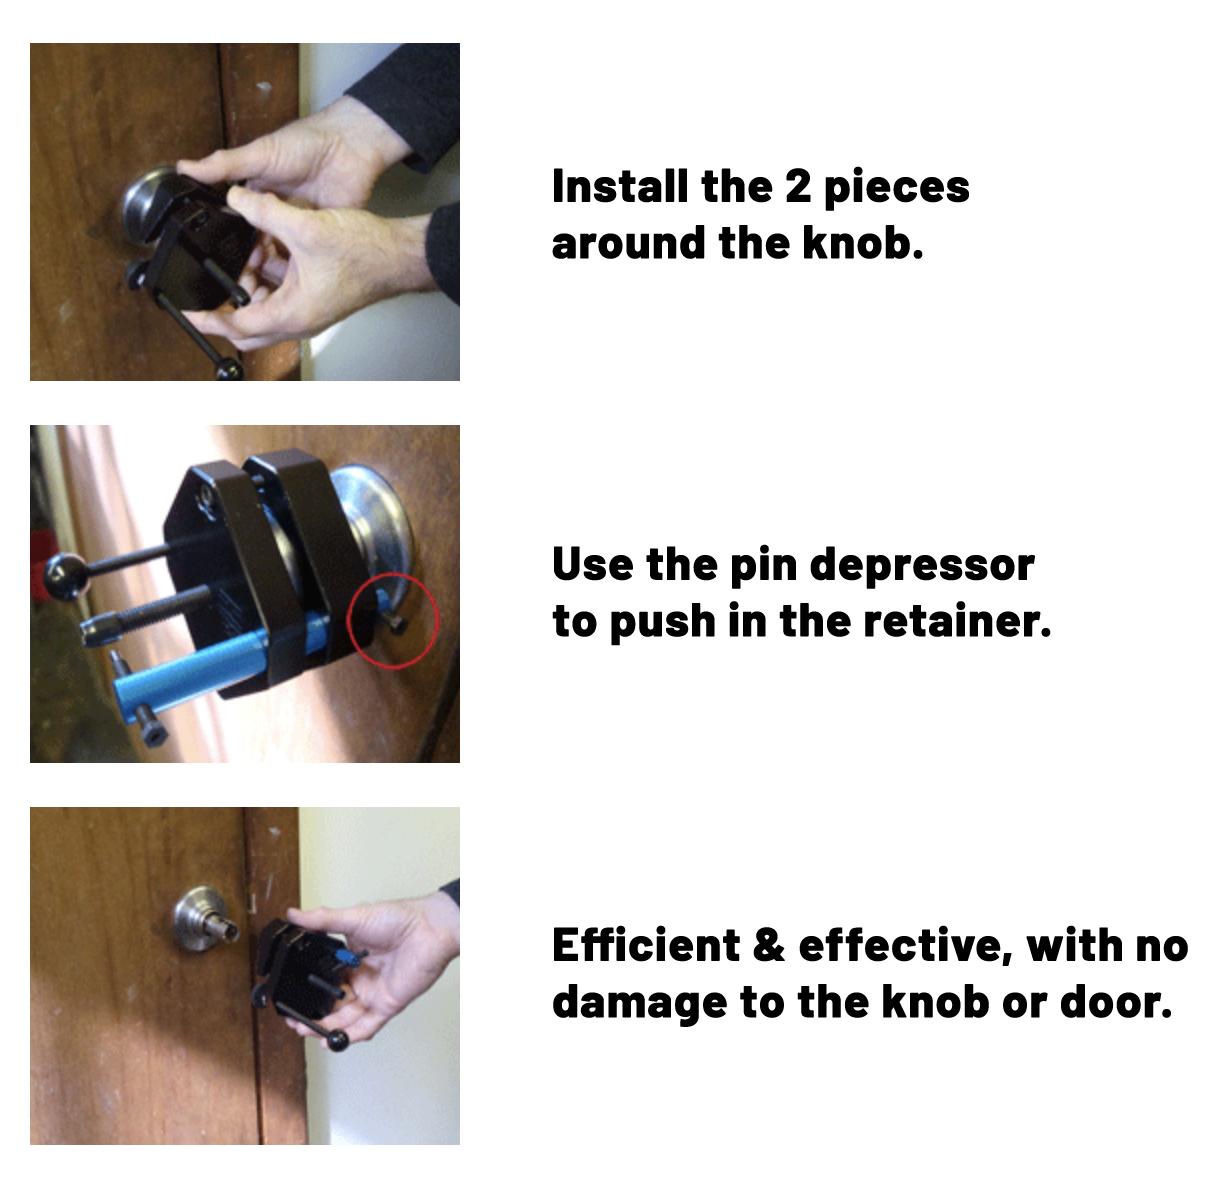 kikr-instructions.jpg